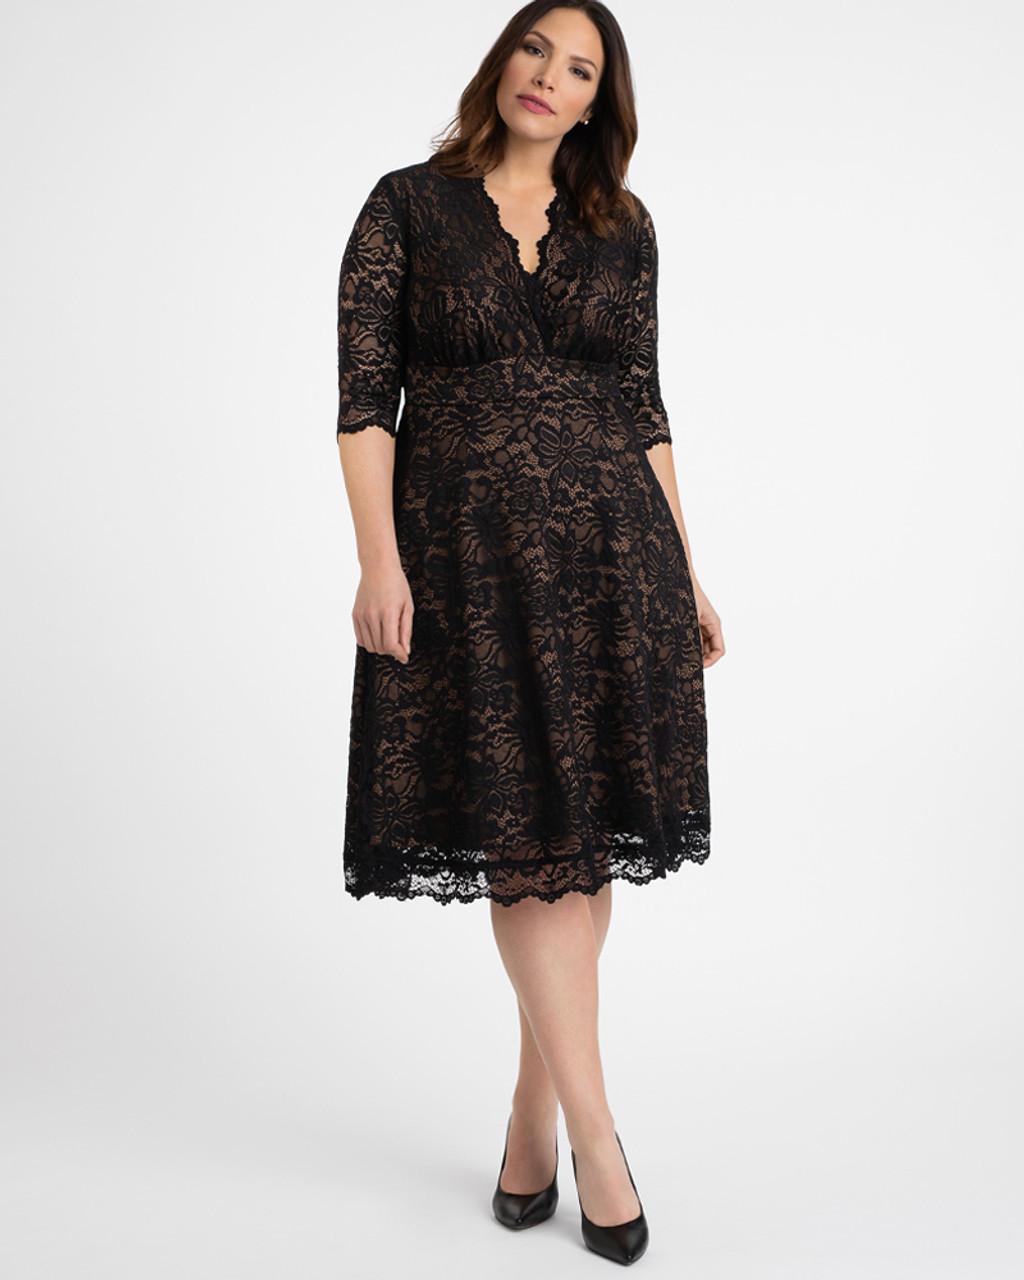 Kiyonna Women\'s Plus Size Mademoiselle Lace Dress~Black/Beige*12150901